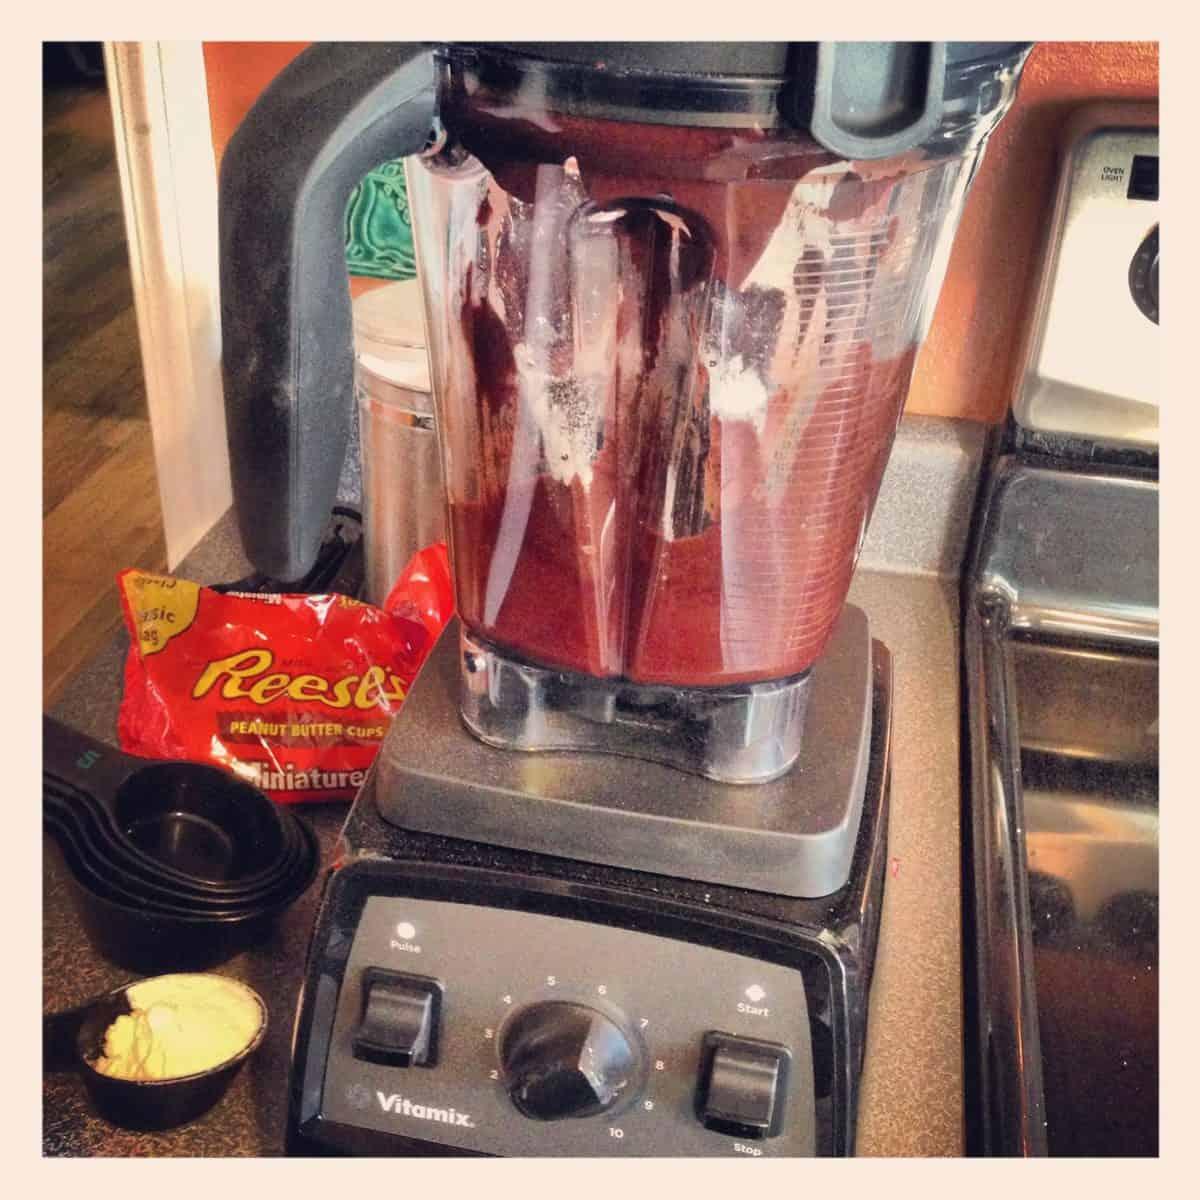 Peanut Butter Cup Blender Brownies – deeply chocolate brownies with a peanut butter cup inside, whipped up in a blender! | foxeslovelemons.com